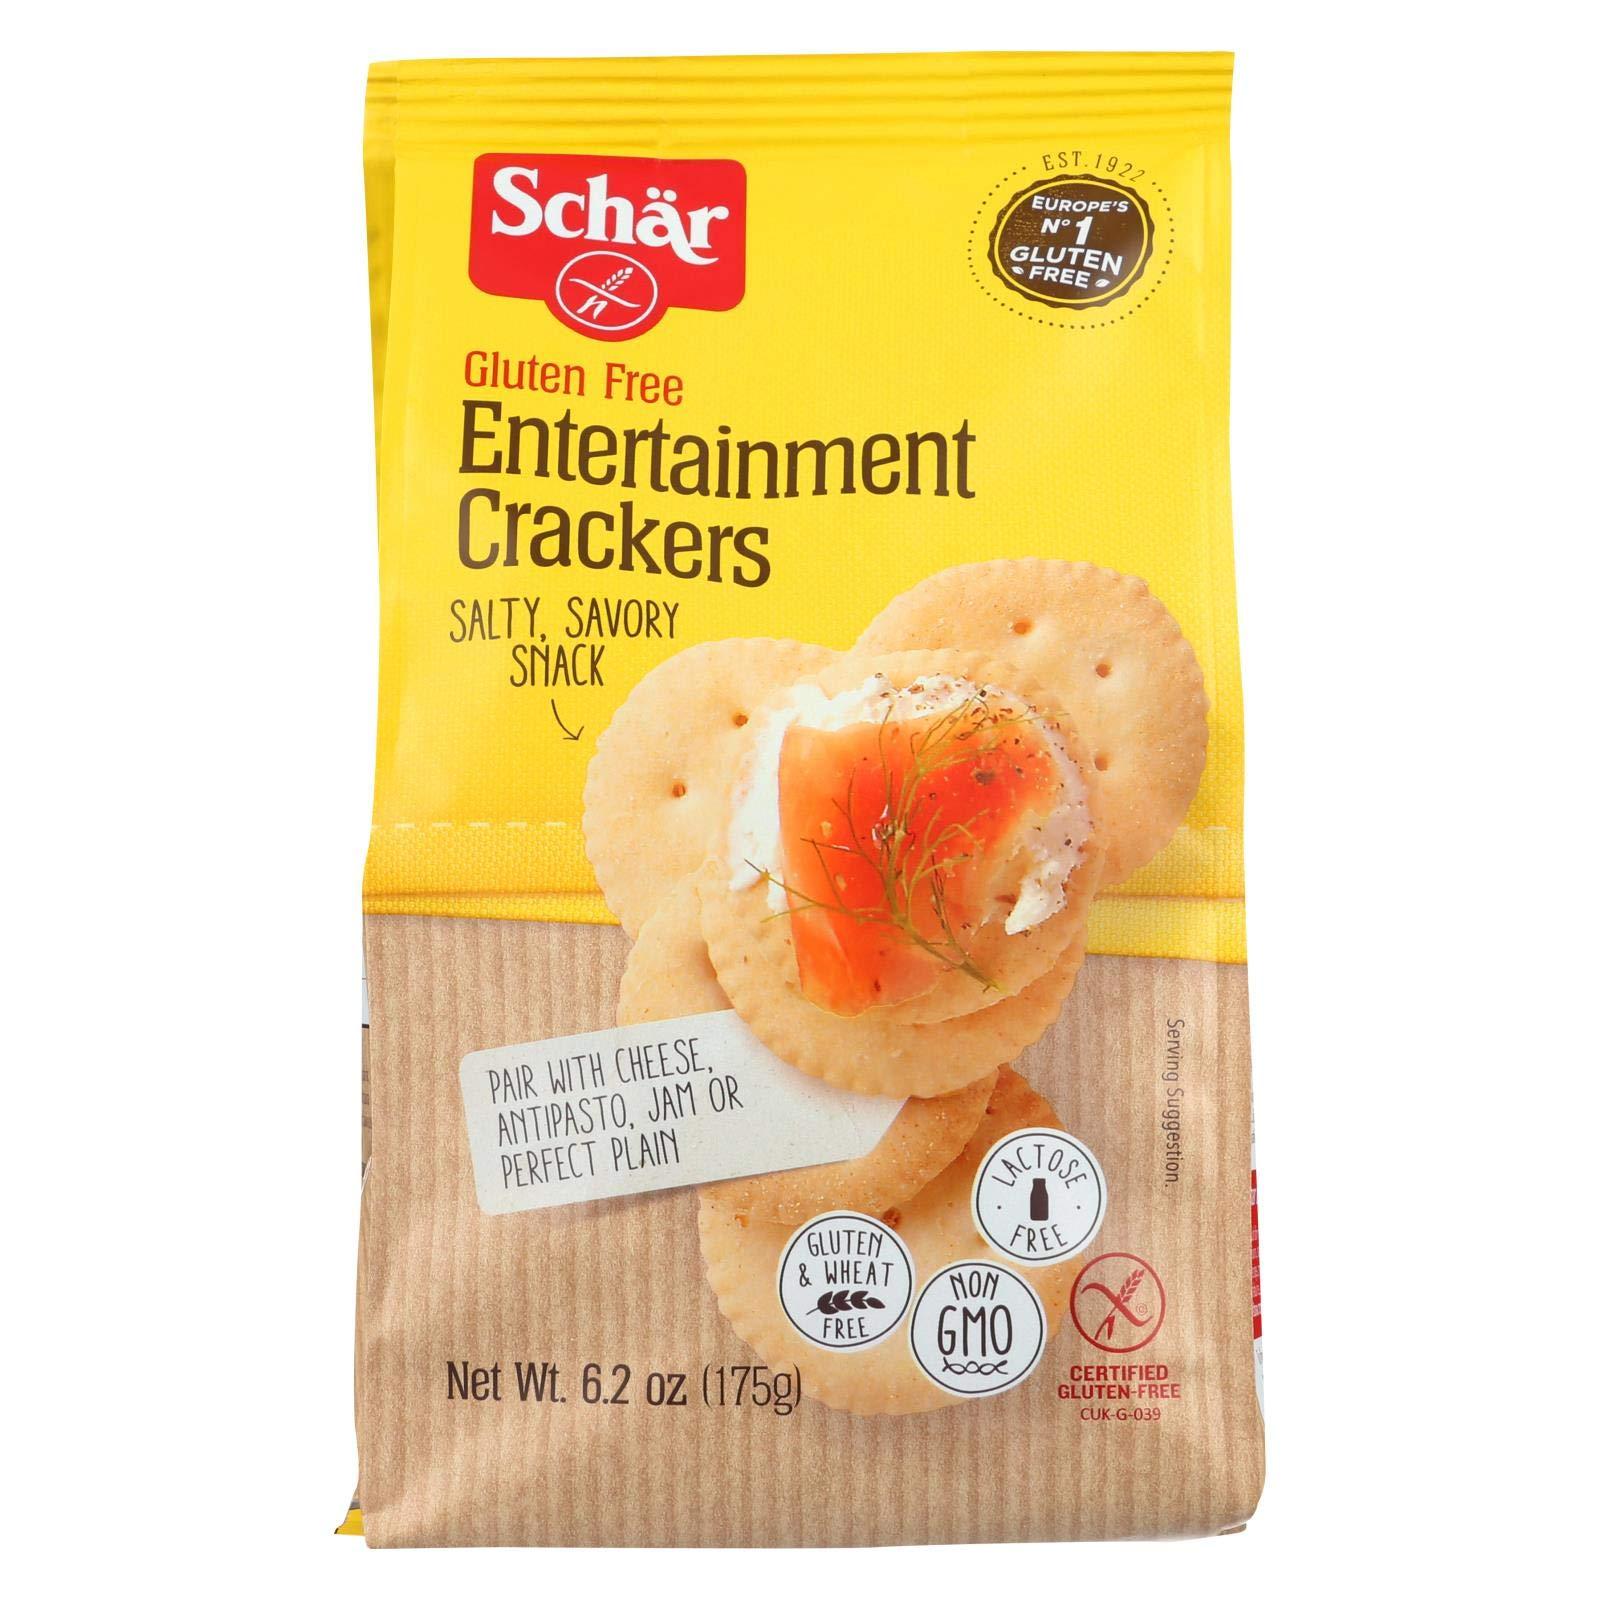 Schar Entertainment Crackers Gluten Free - Case of 6 - 6.2 oz. by Schar